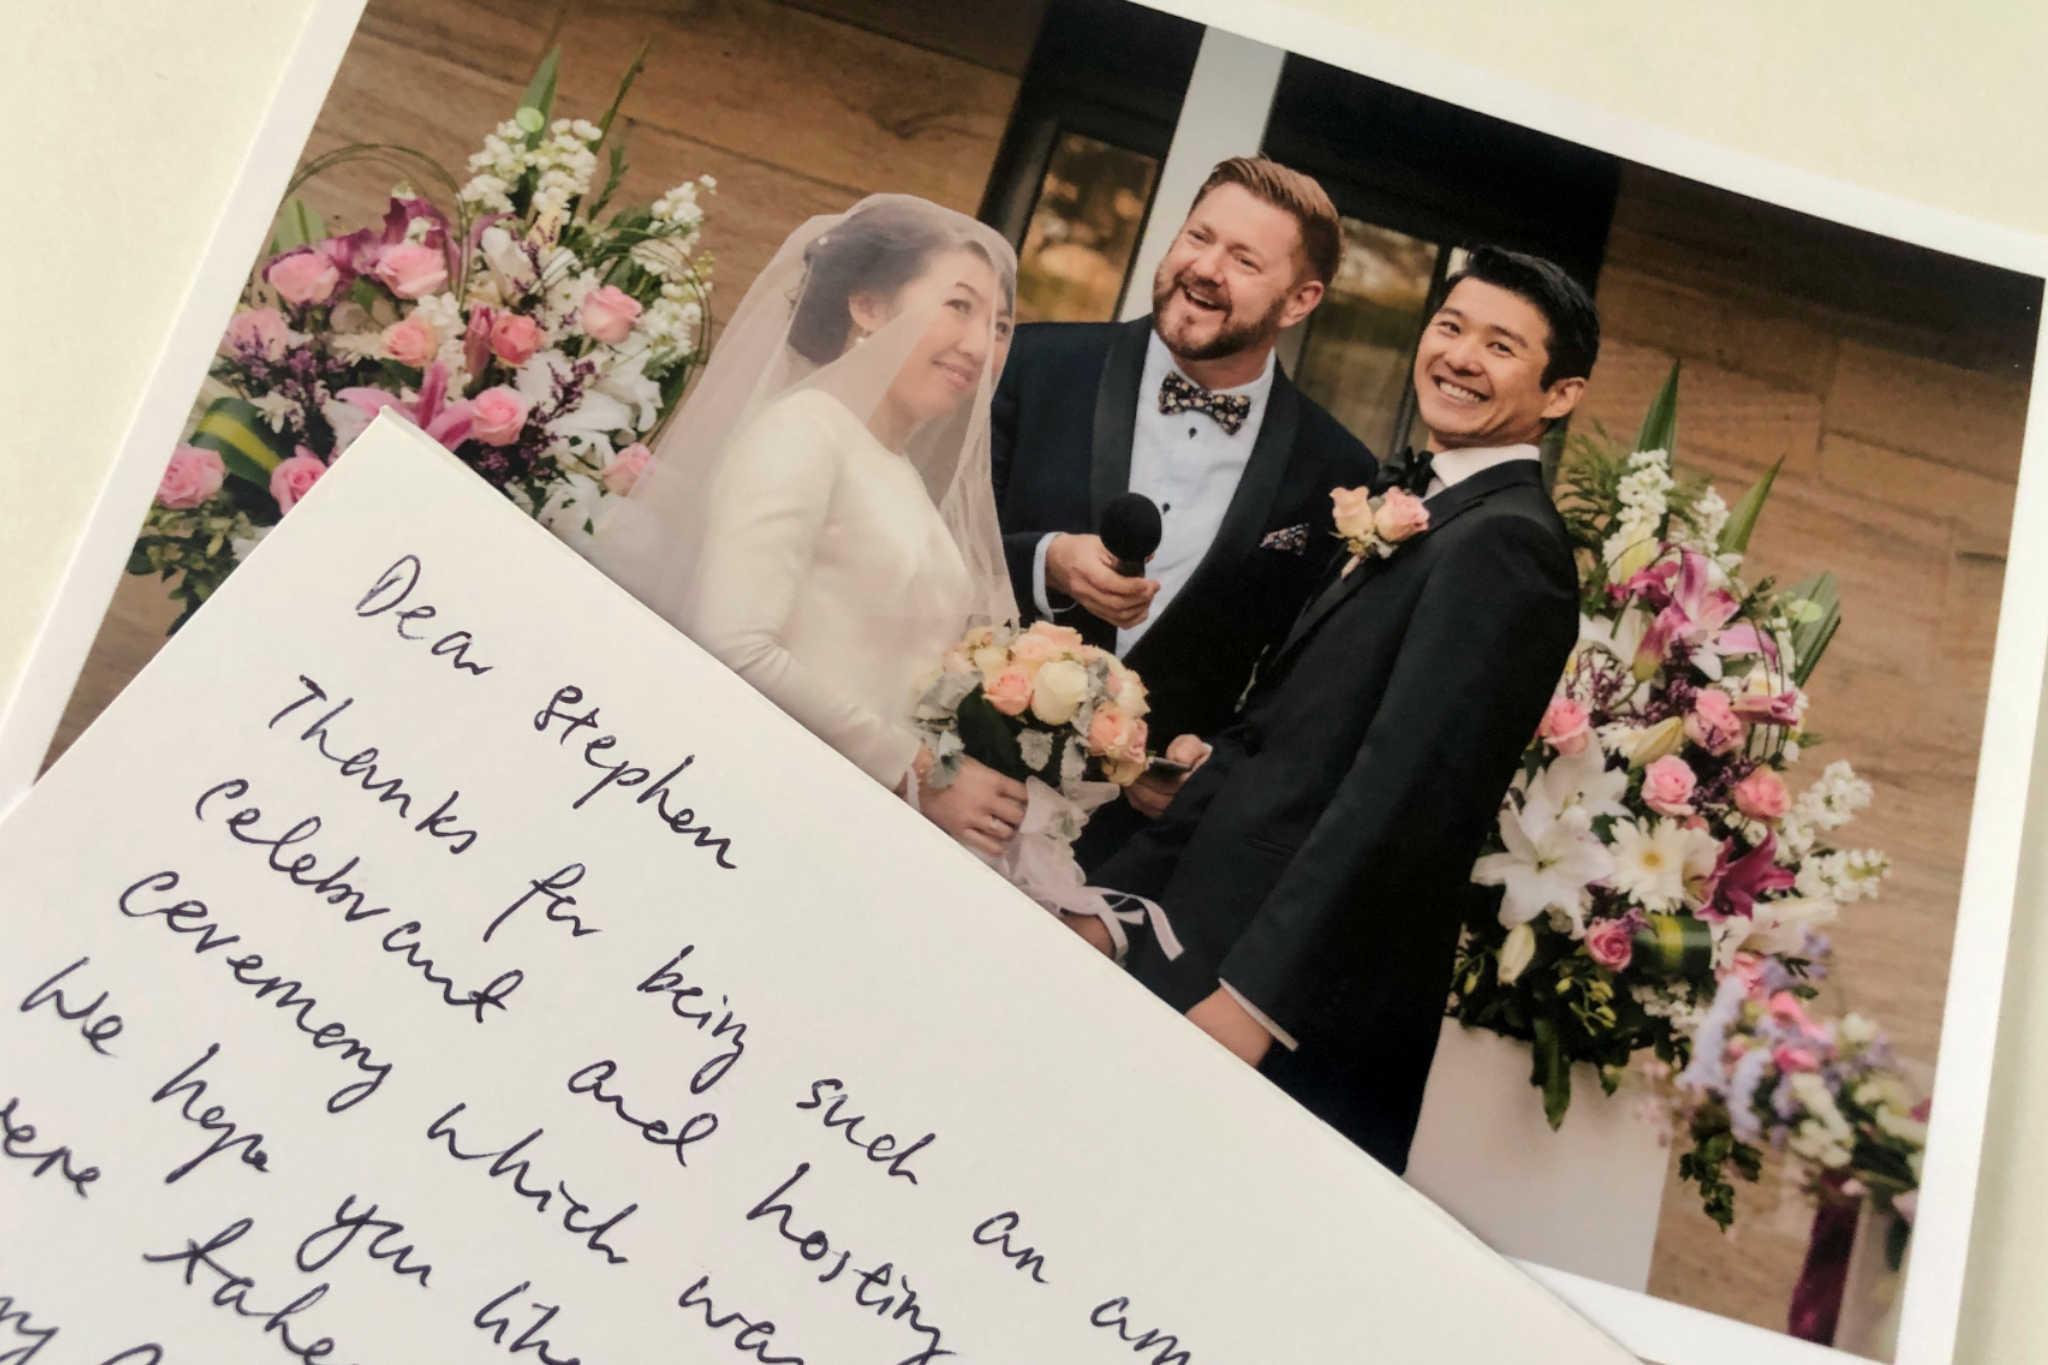 Gunners Barracks Wedding Review - Sydney Marriage Celebrant Stephen Lee